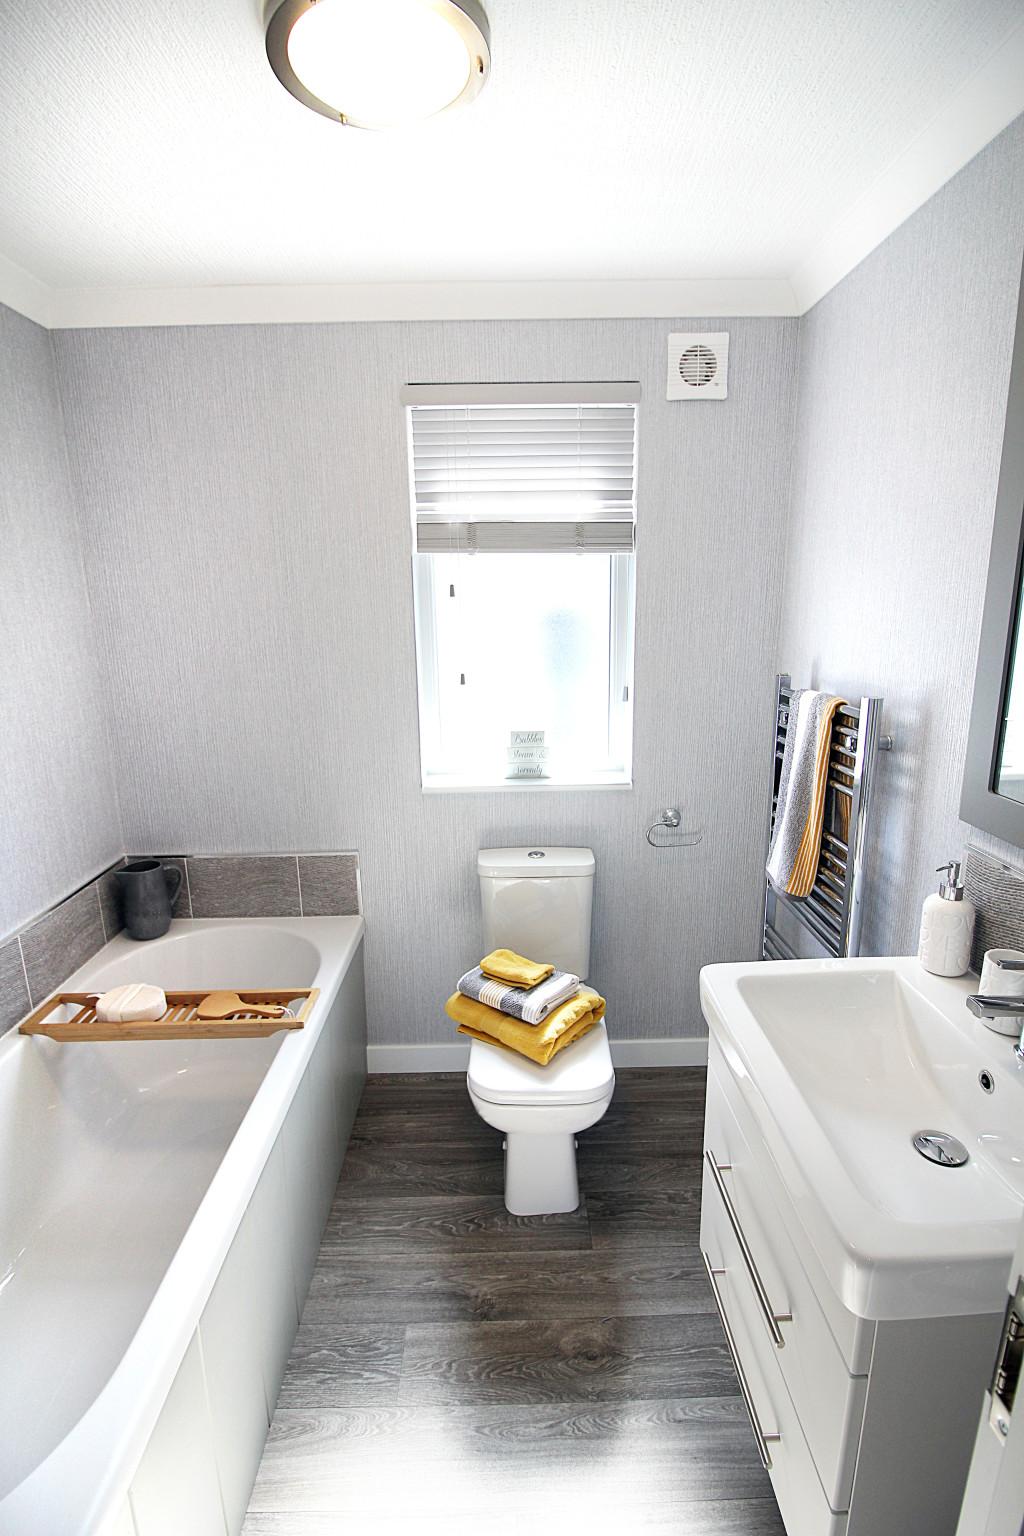 Omar Image Bathroom